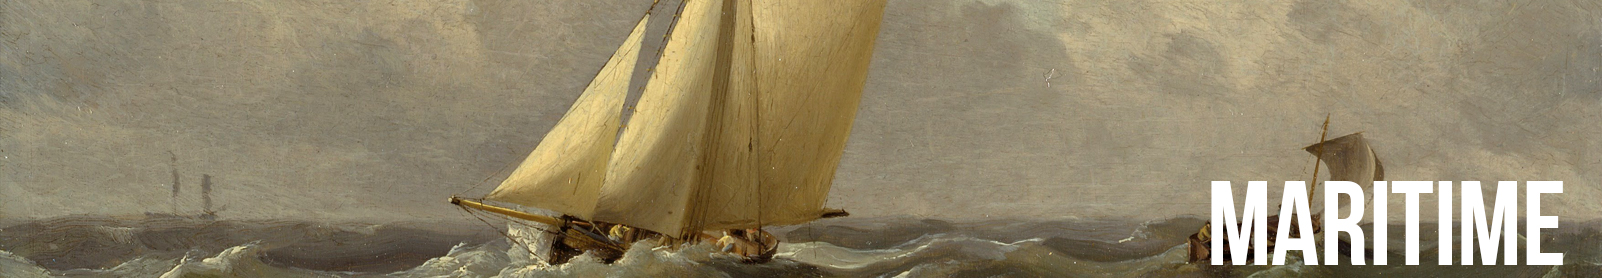 maritime-small-banner.jpg